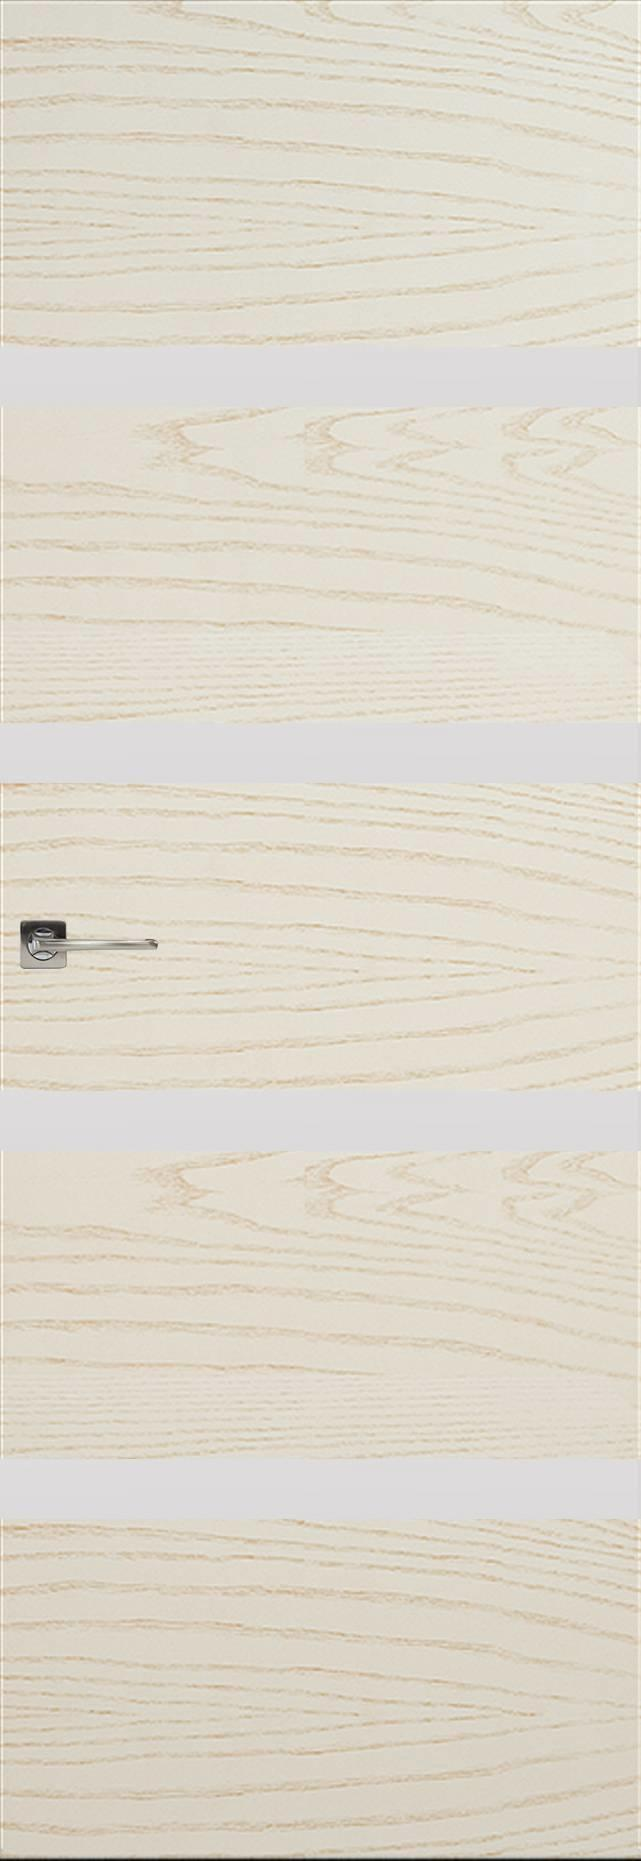 Tivoli Д-4 Invisible цвет - Ясень бежевая эмаль Без стекла (ДГ)